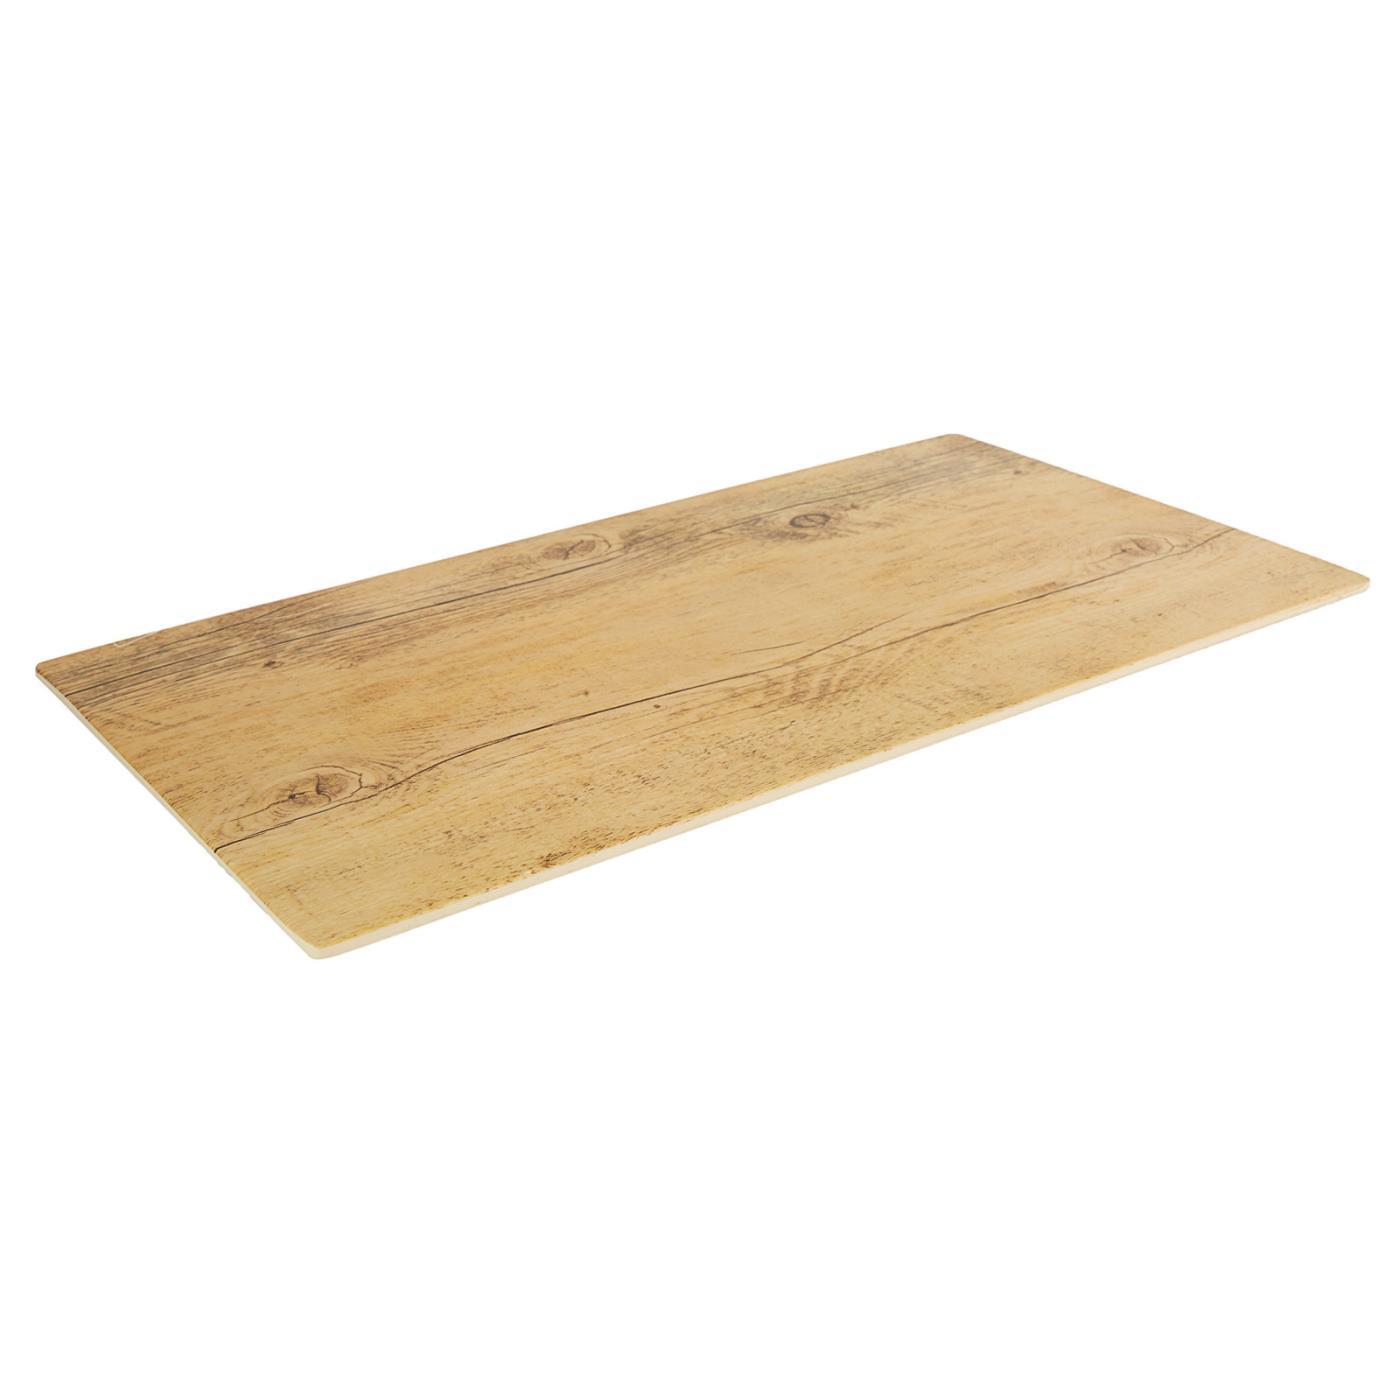 "Wood Plank - 18"" x 10"""